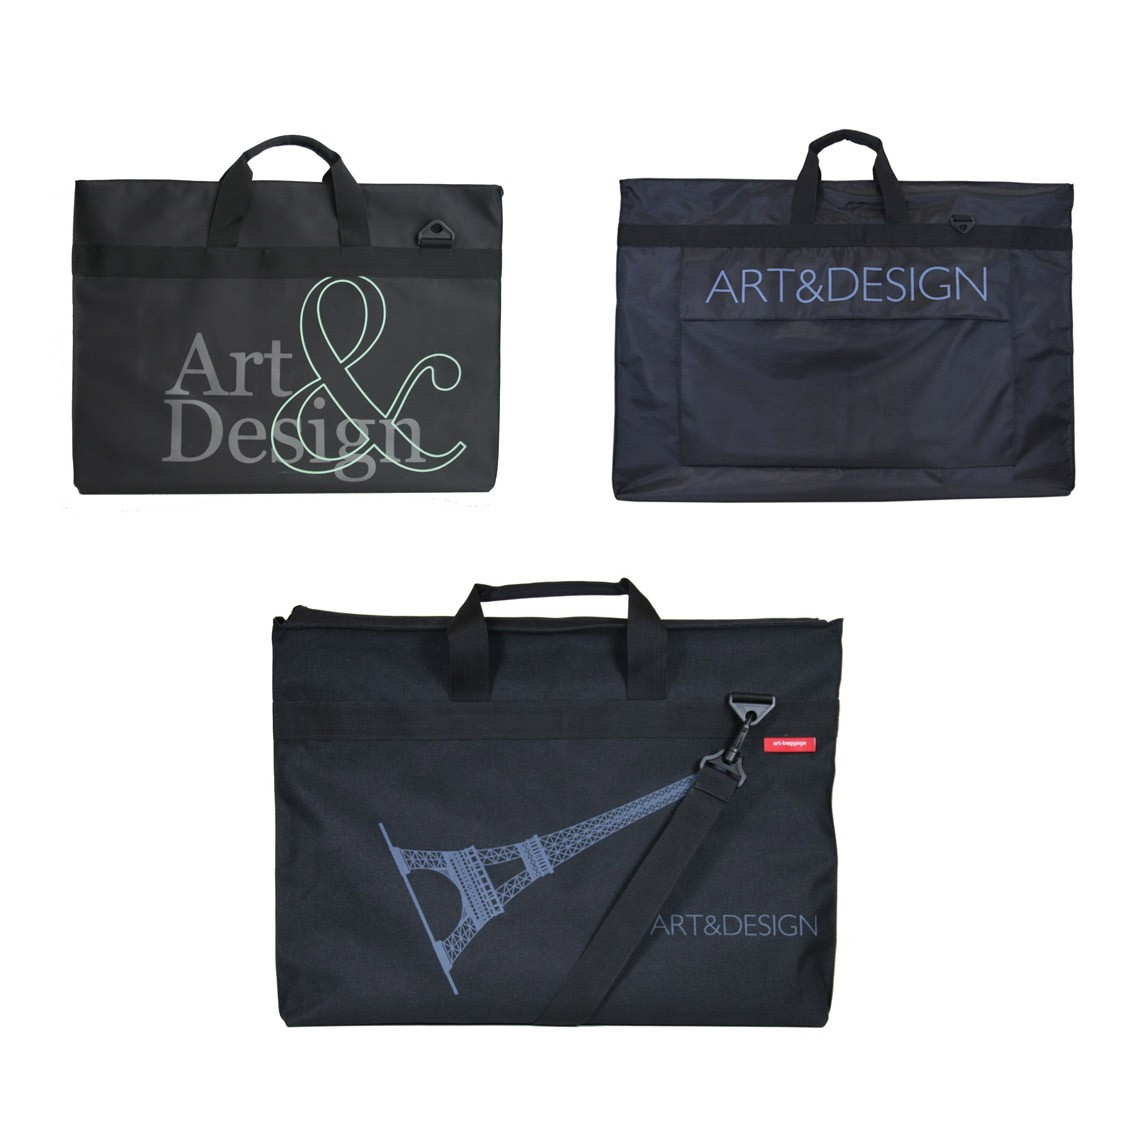 сумки планшетники выкройка